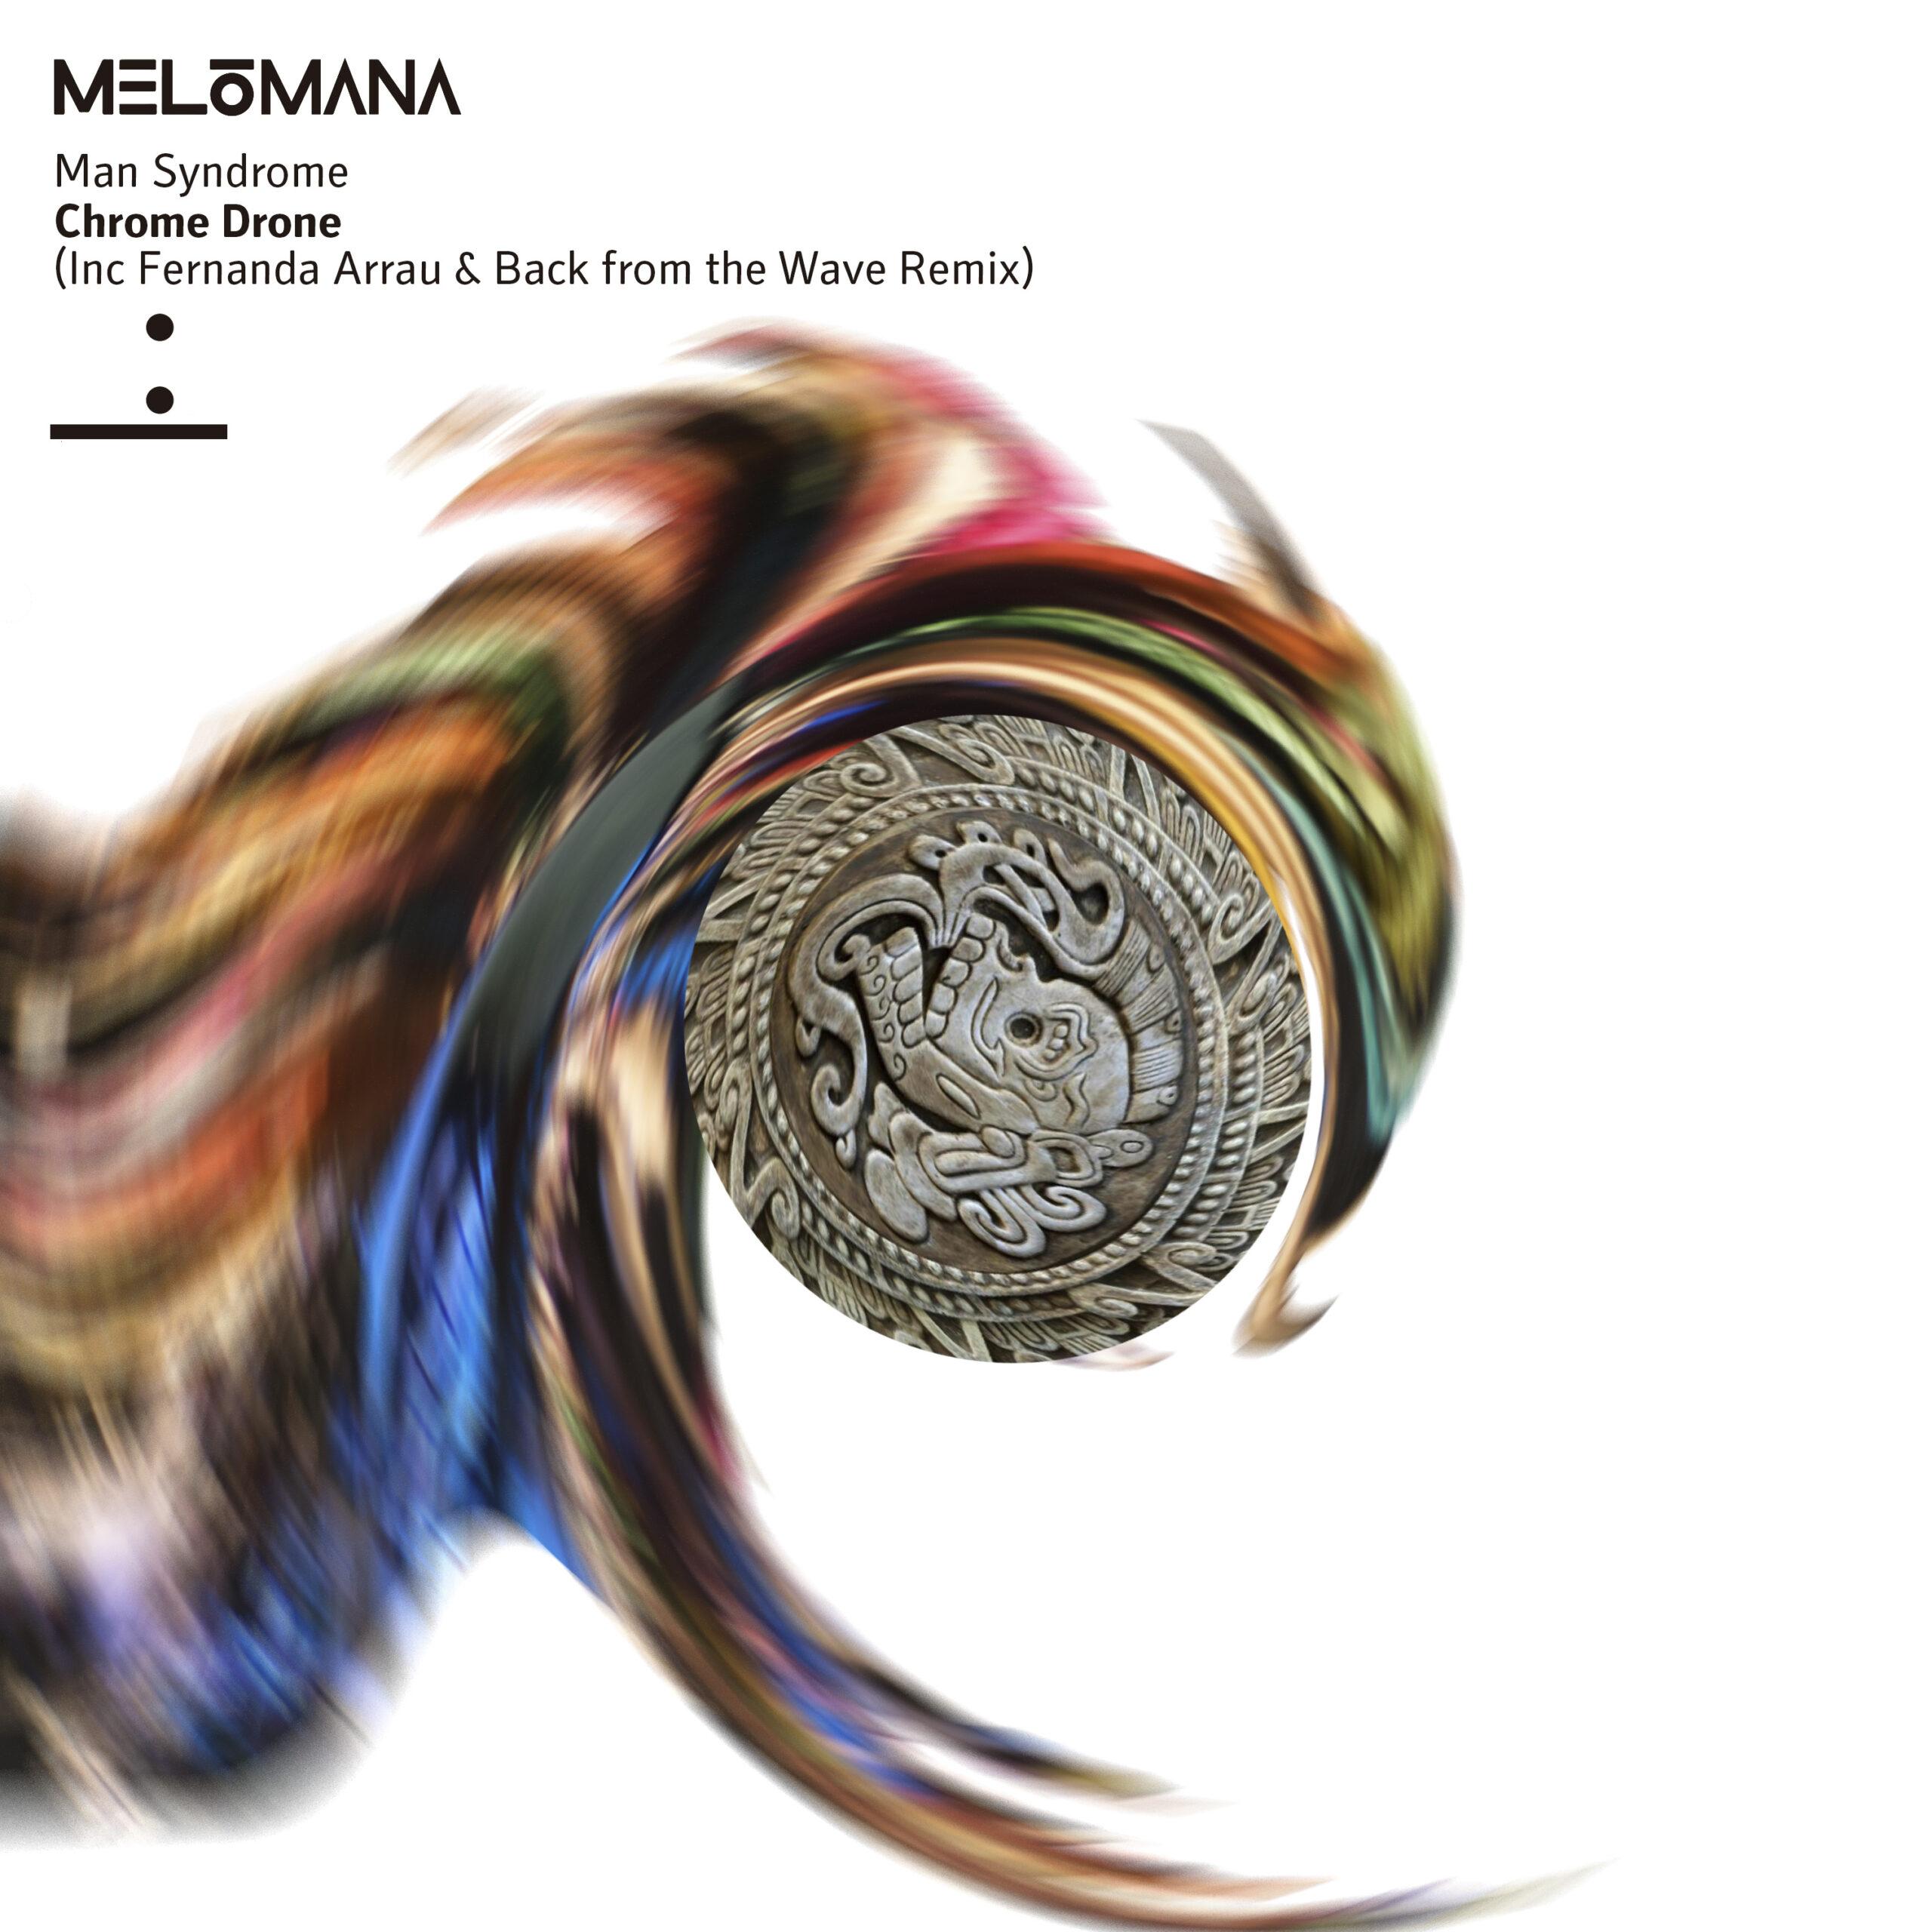 PREMIERE: Man Syndrome - Polychrome Drone [Melómana Records] (2020)